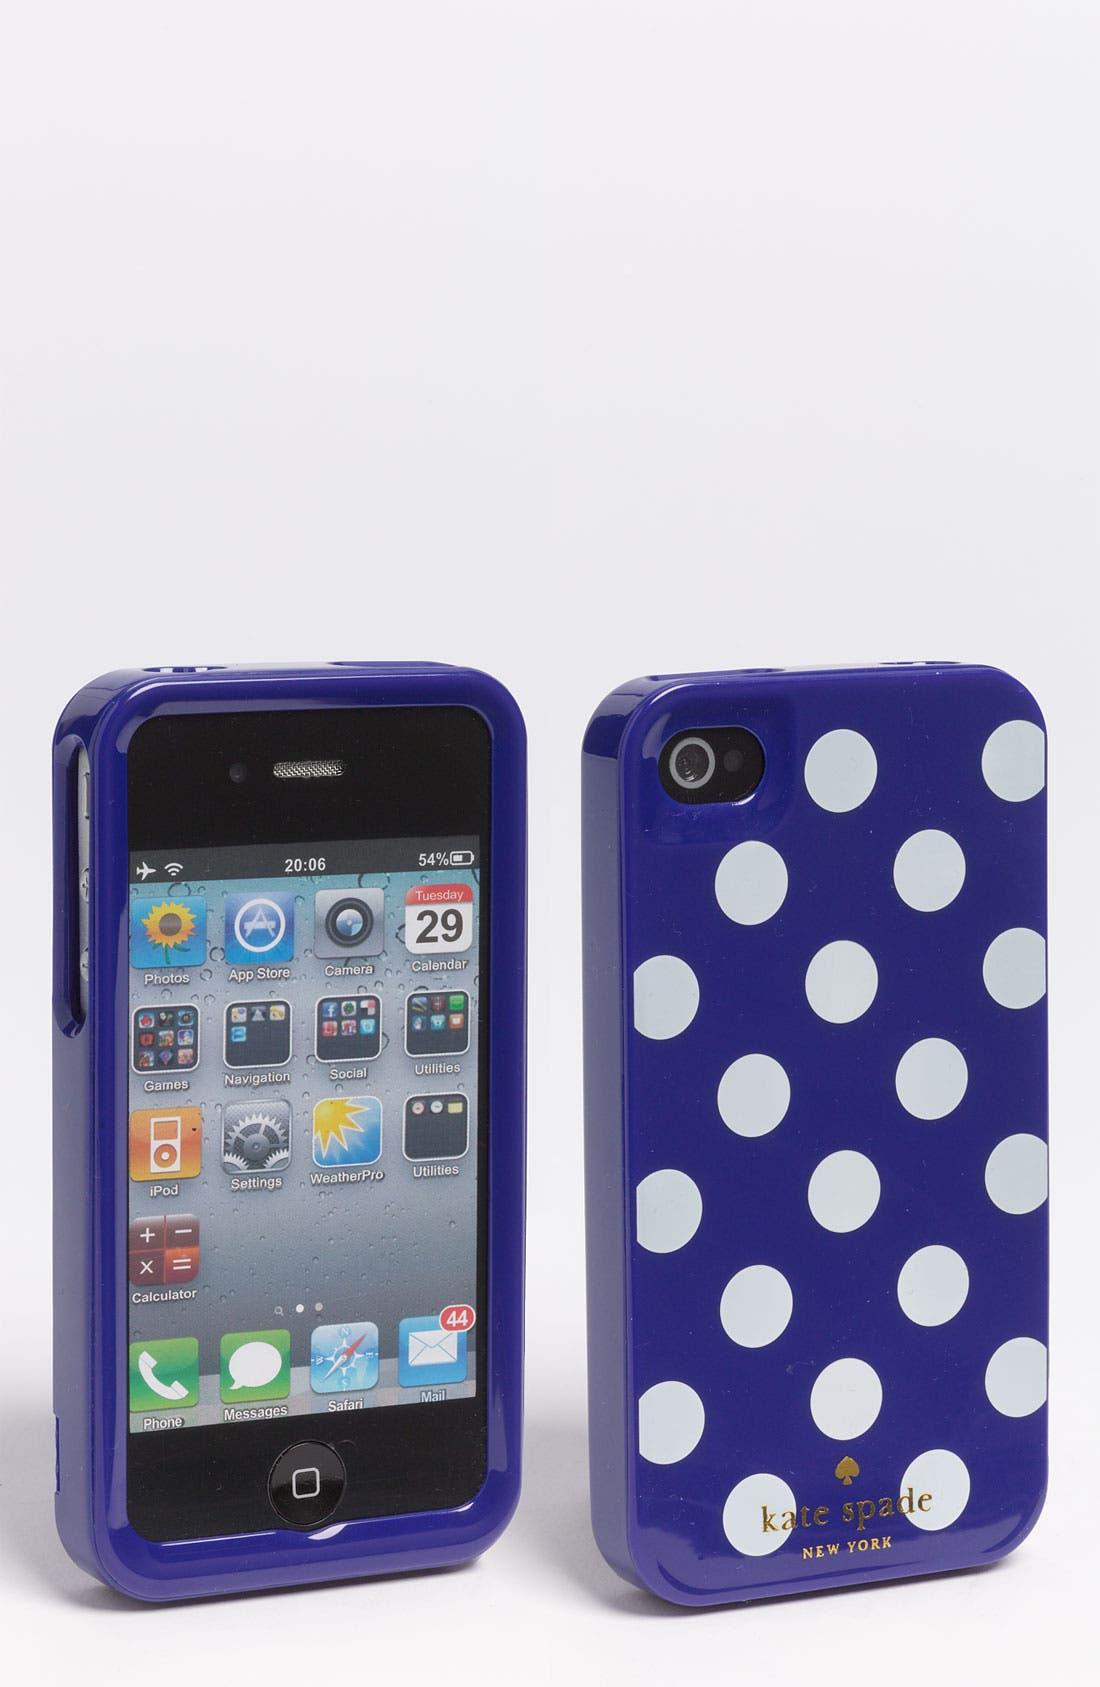 Main Image - kate spade new york 'la pavillion' iPhone 4 & 4S case